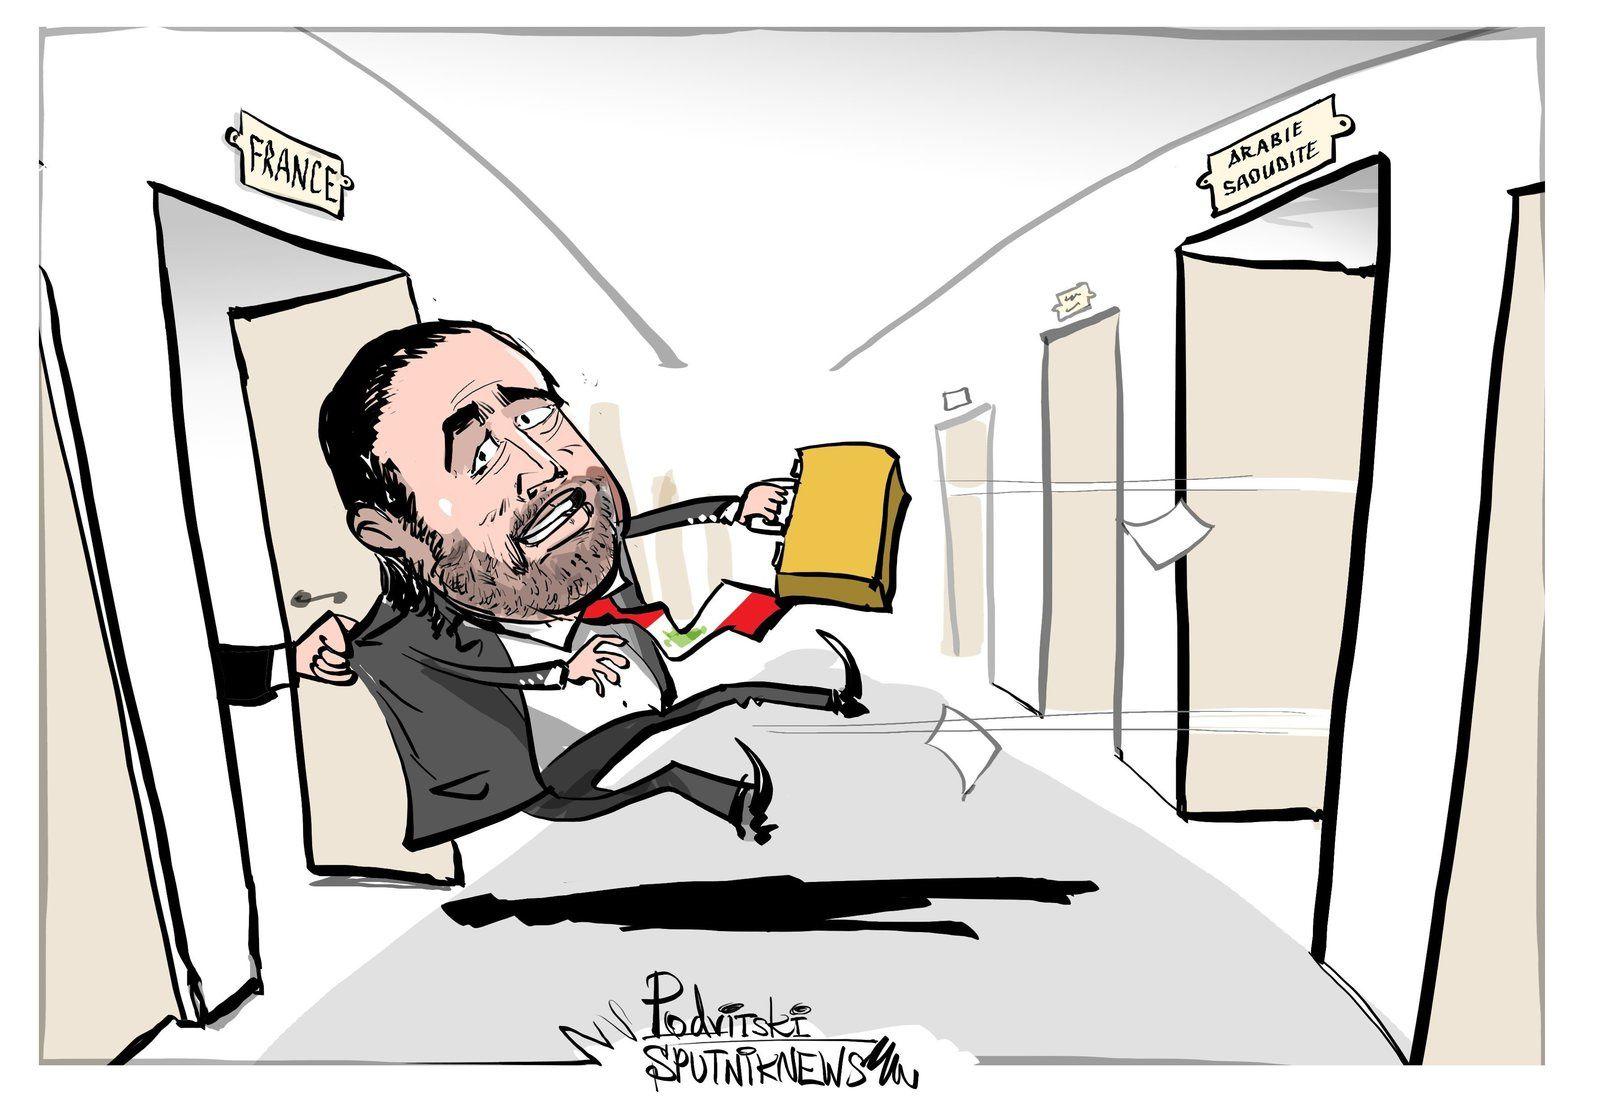 Saad Hariri, premier ministre du Liban: l'enfumage d'Emmanuel Macron